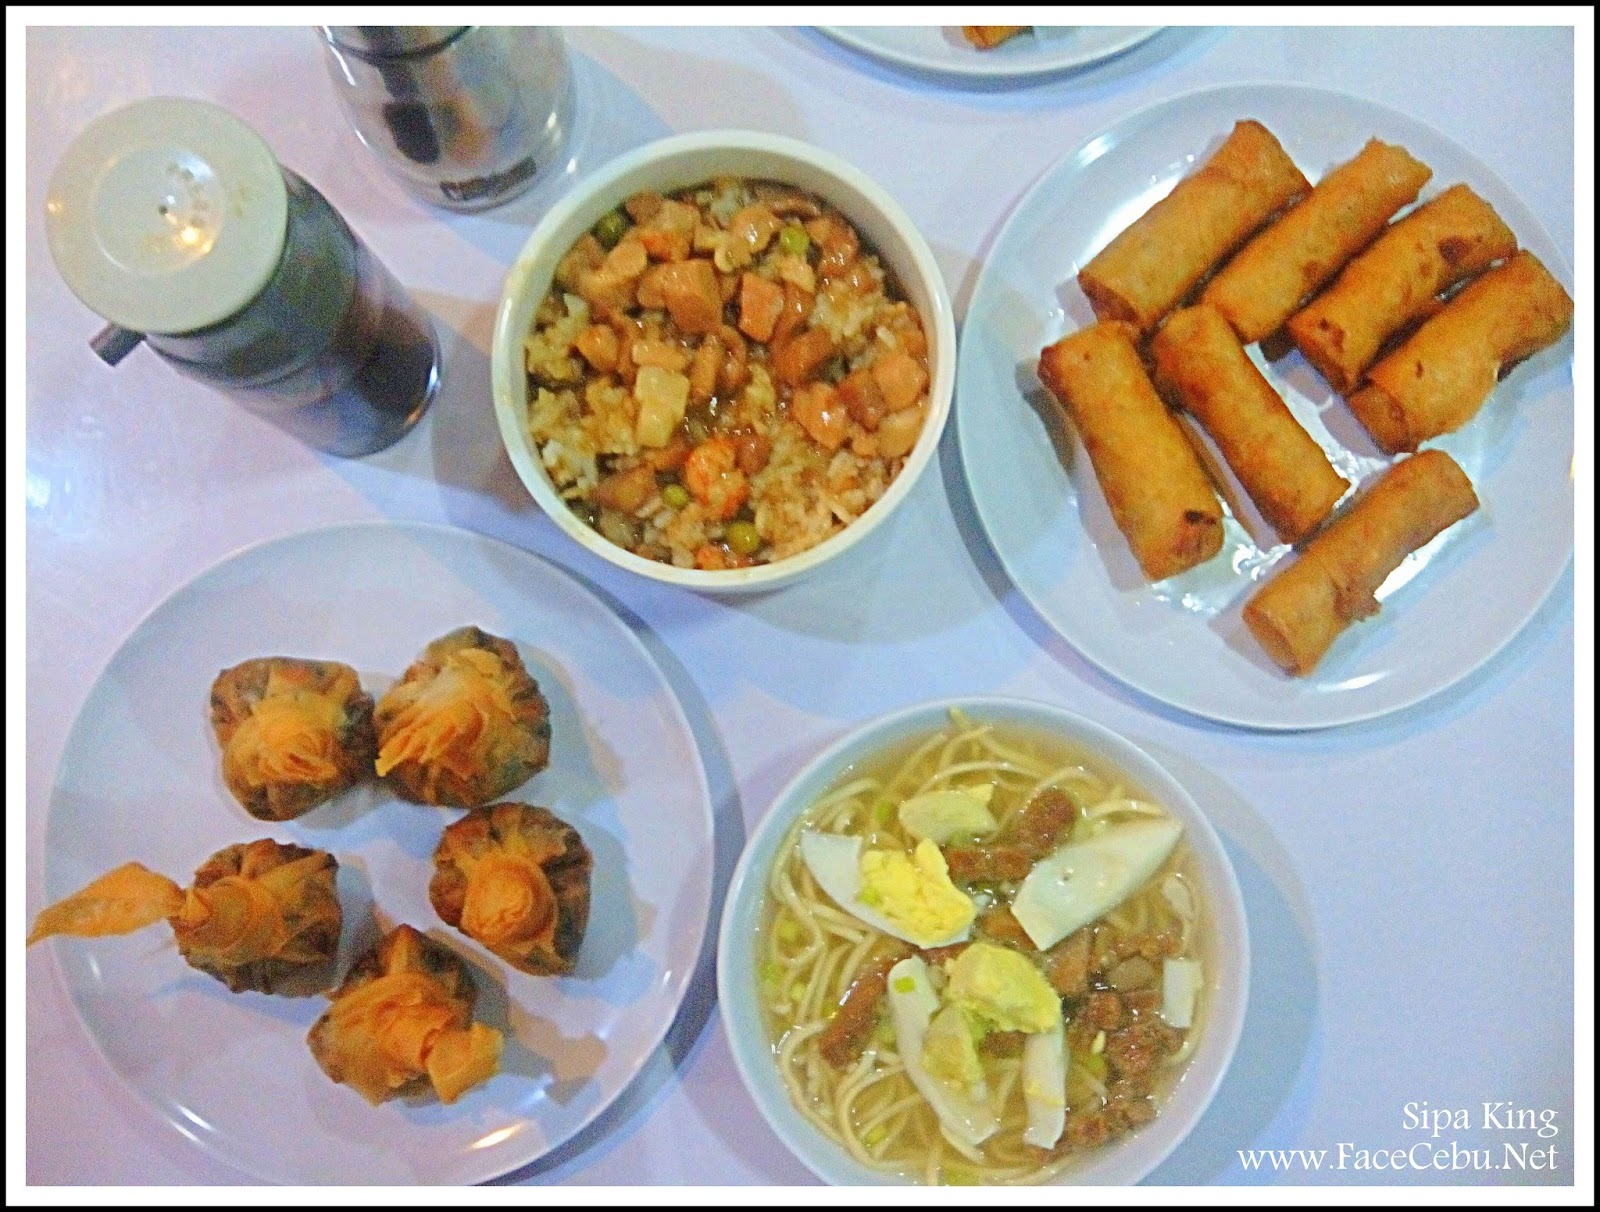 Cebu's Face | Travel, Lifestyle, Food & News: Sipa King